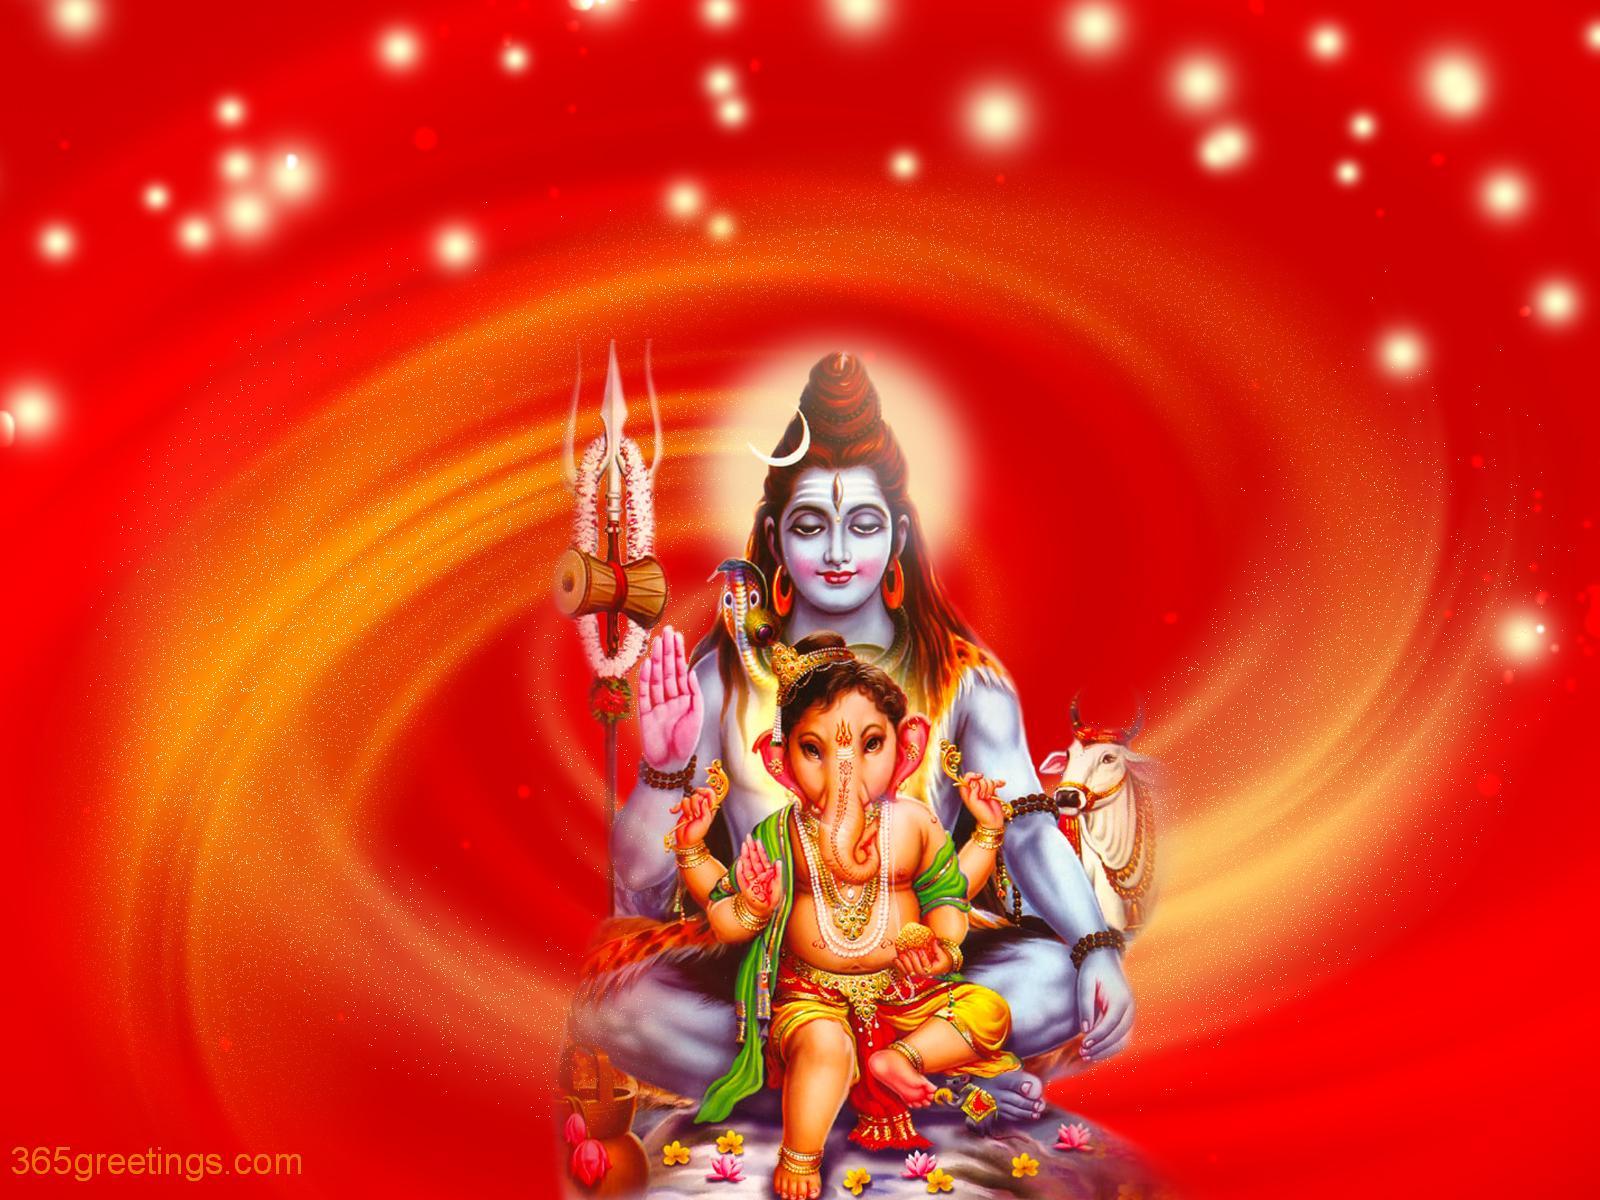 Wallpaper download lord shiva -  Lord Shiva Wallpaper